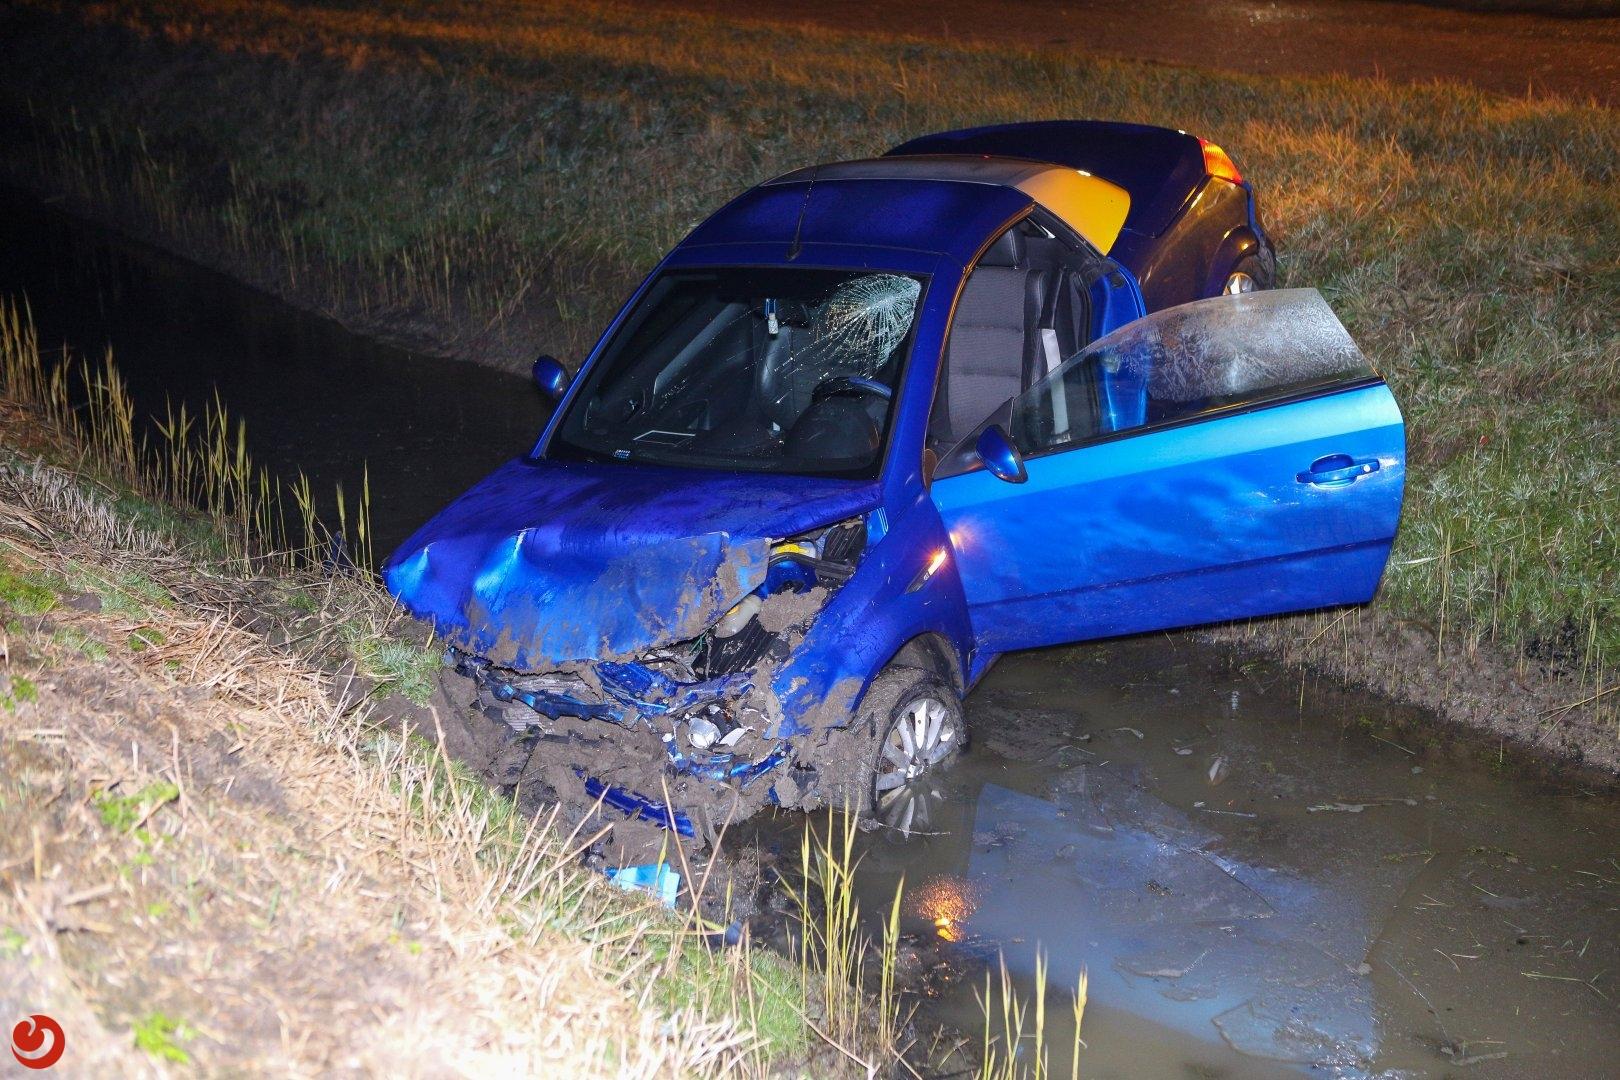 Persoon gewond na ongeval